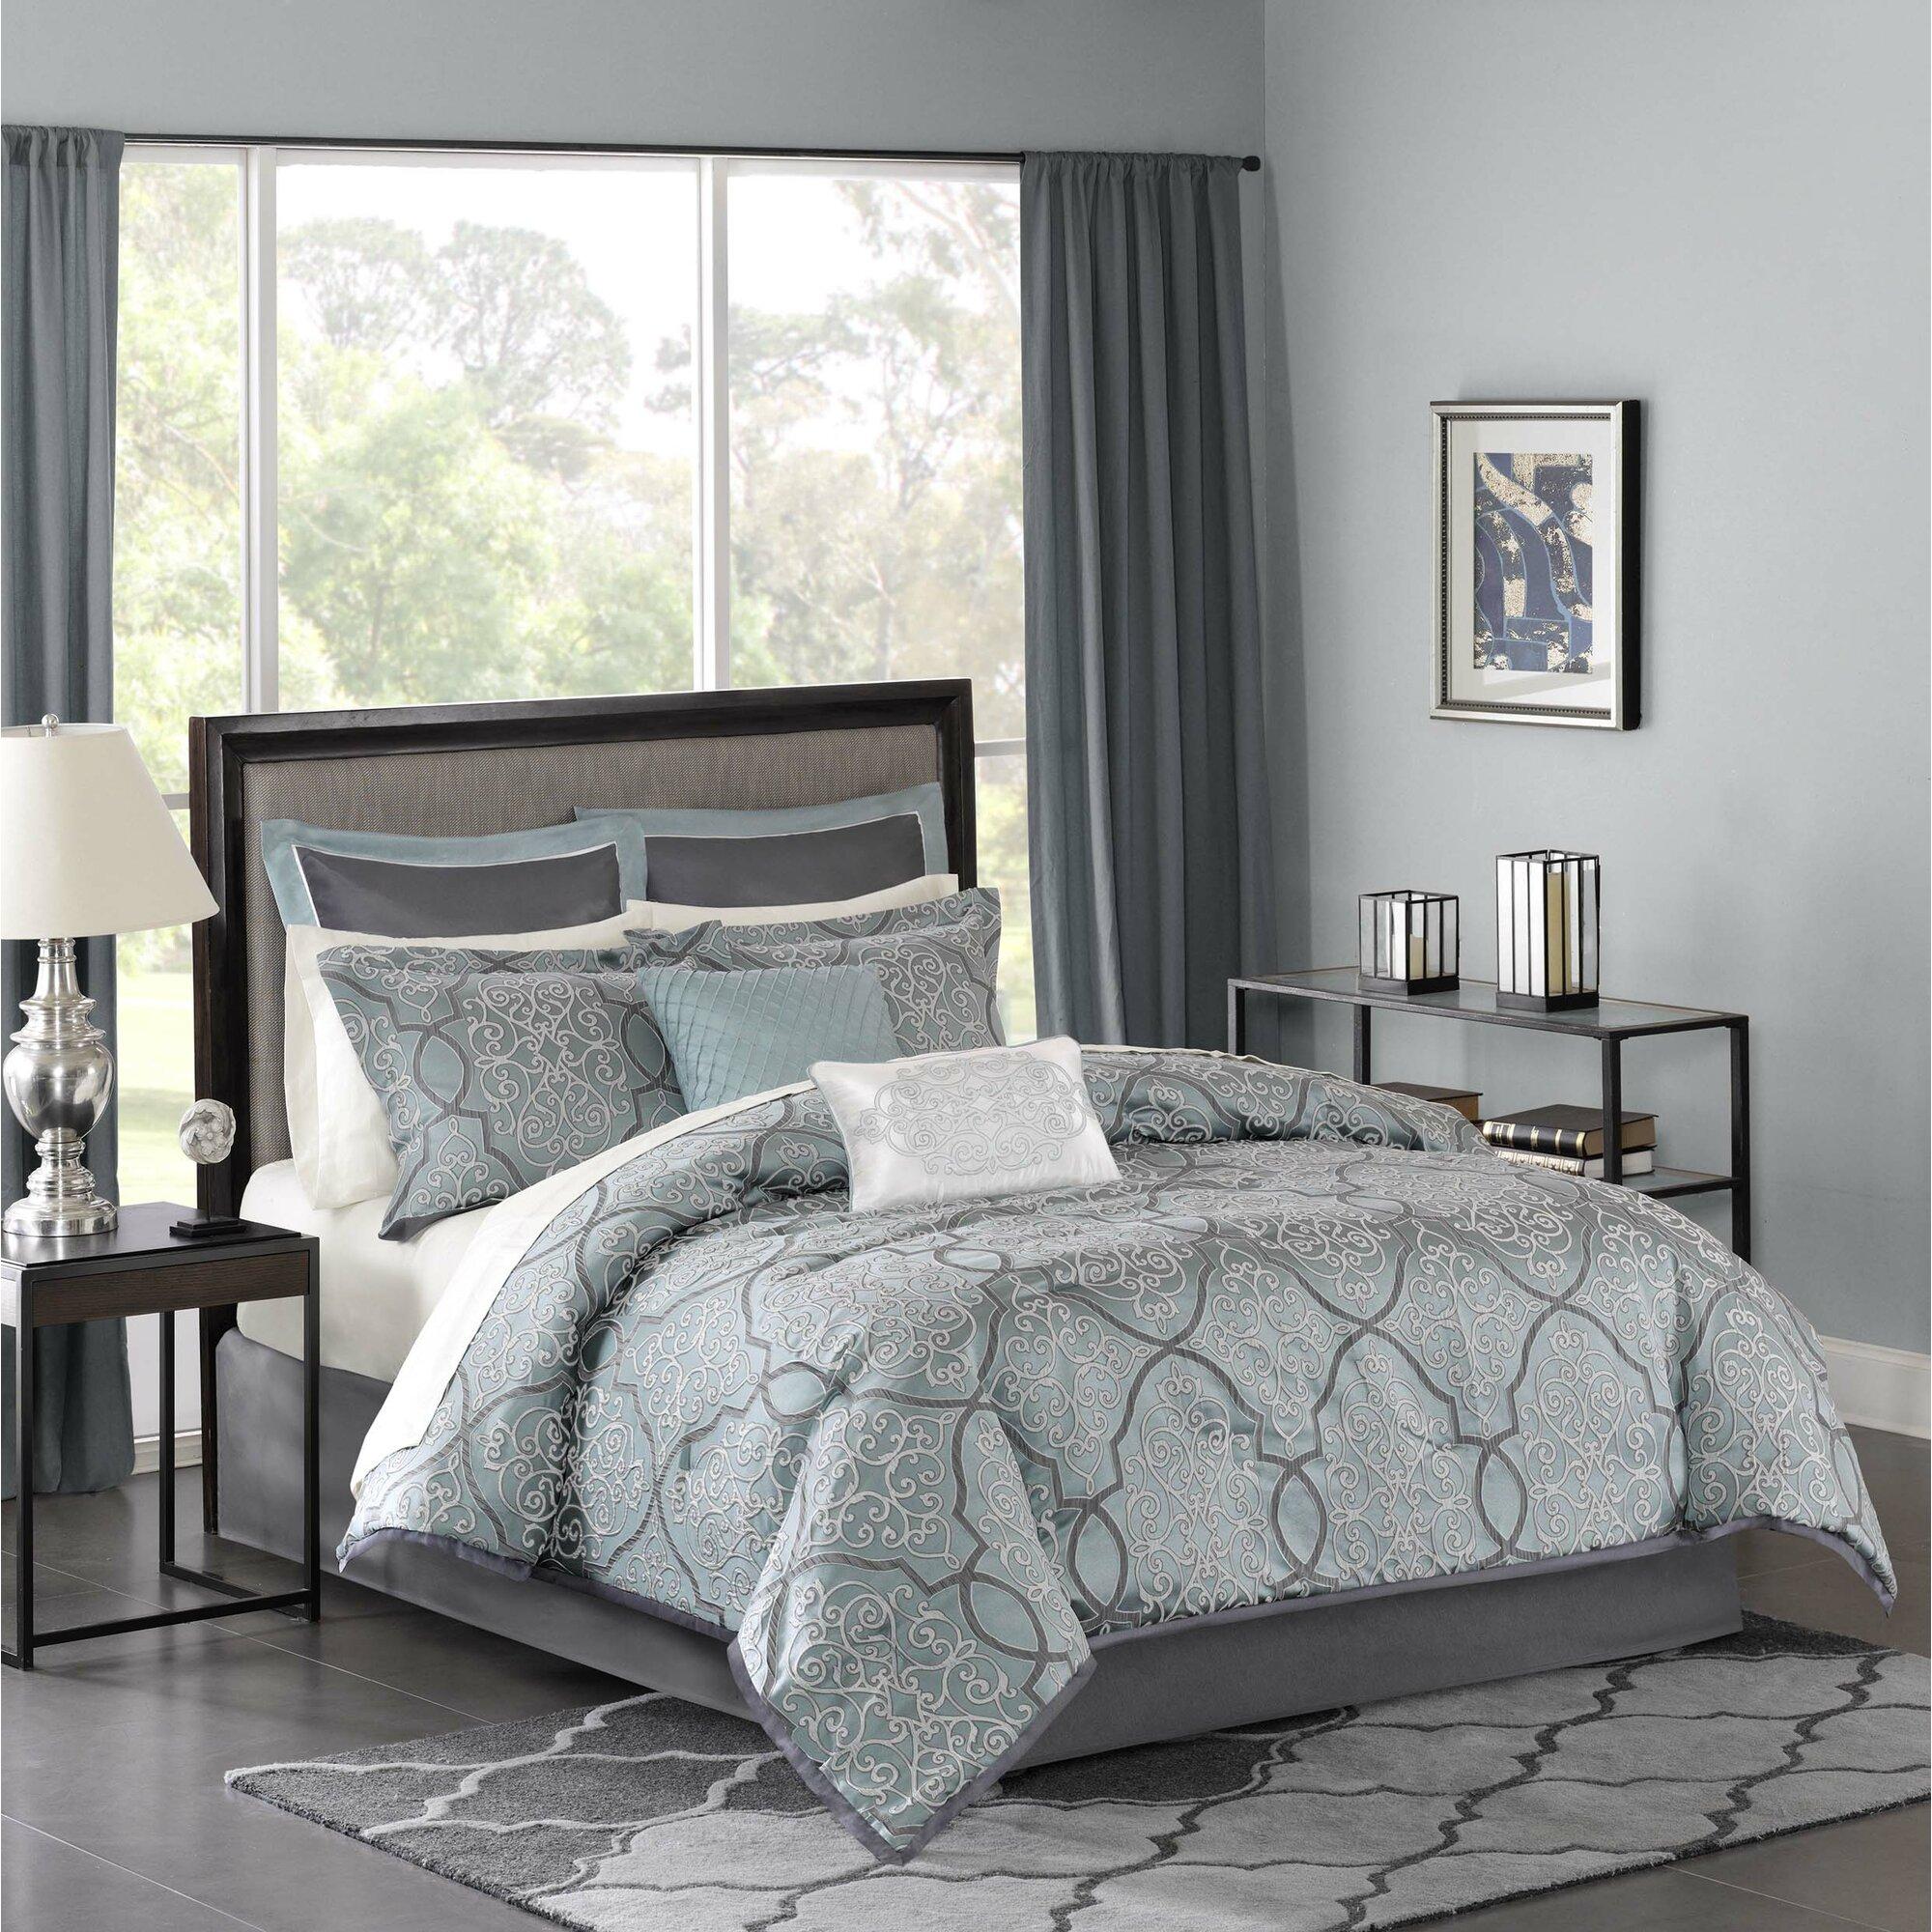 Blue bedspreads and comforters - Dreiling 12 Piece Comforter Set